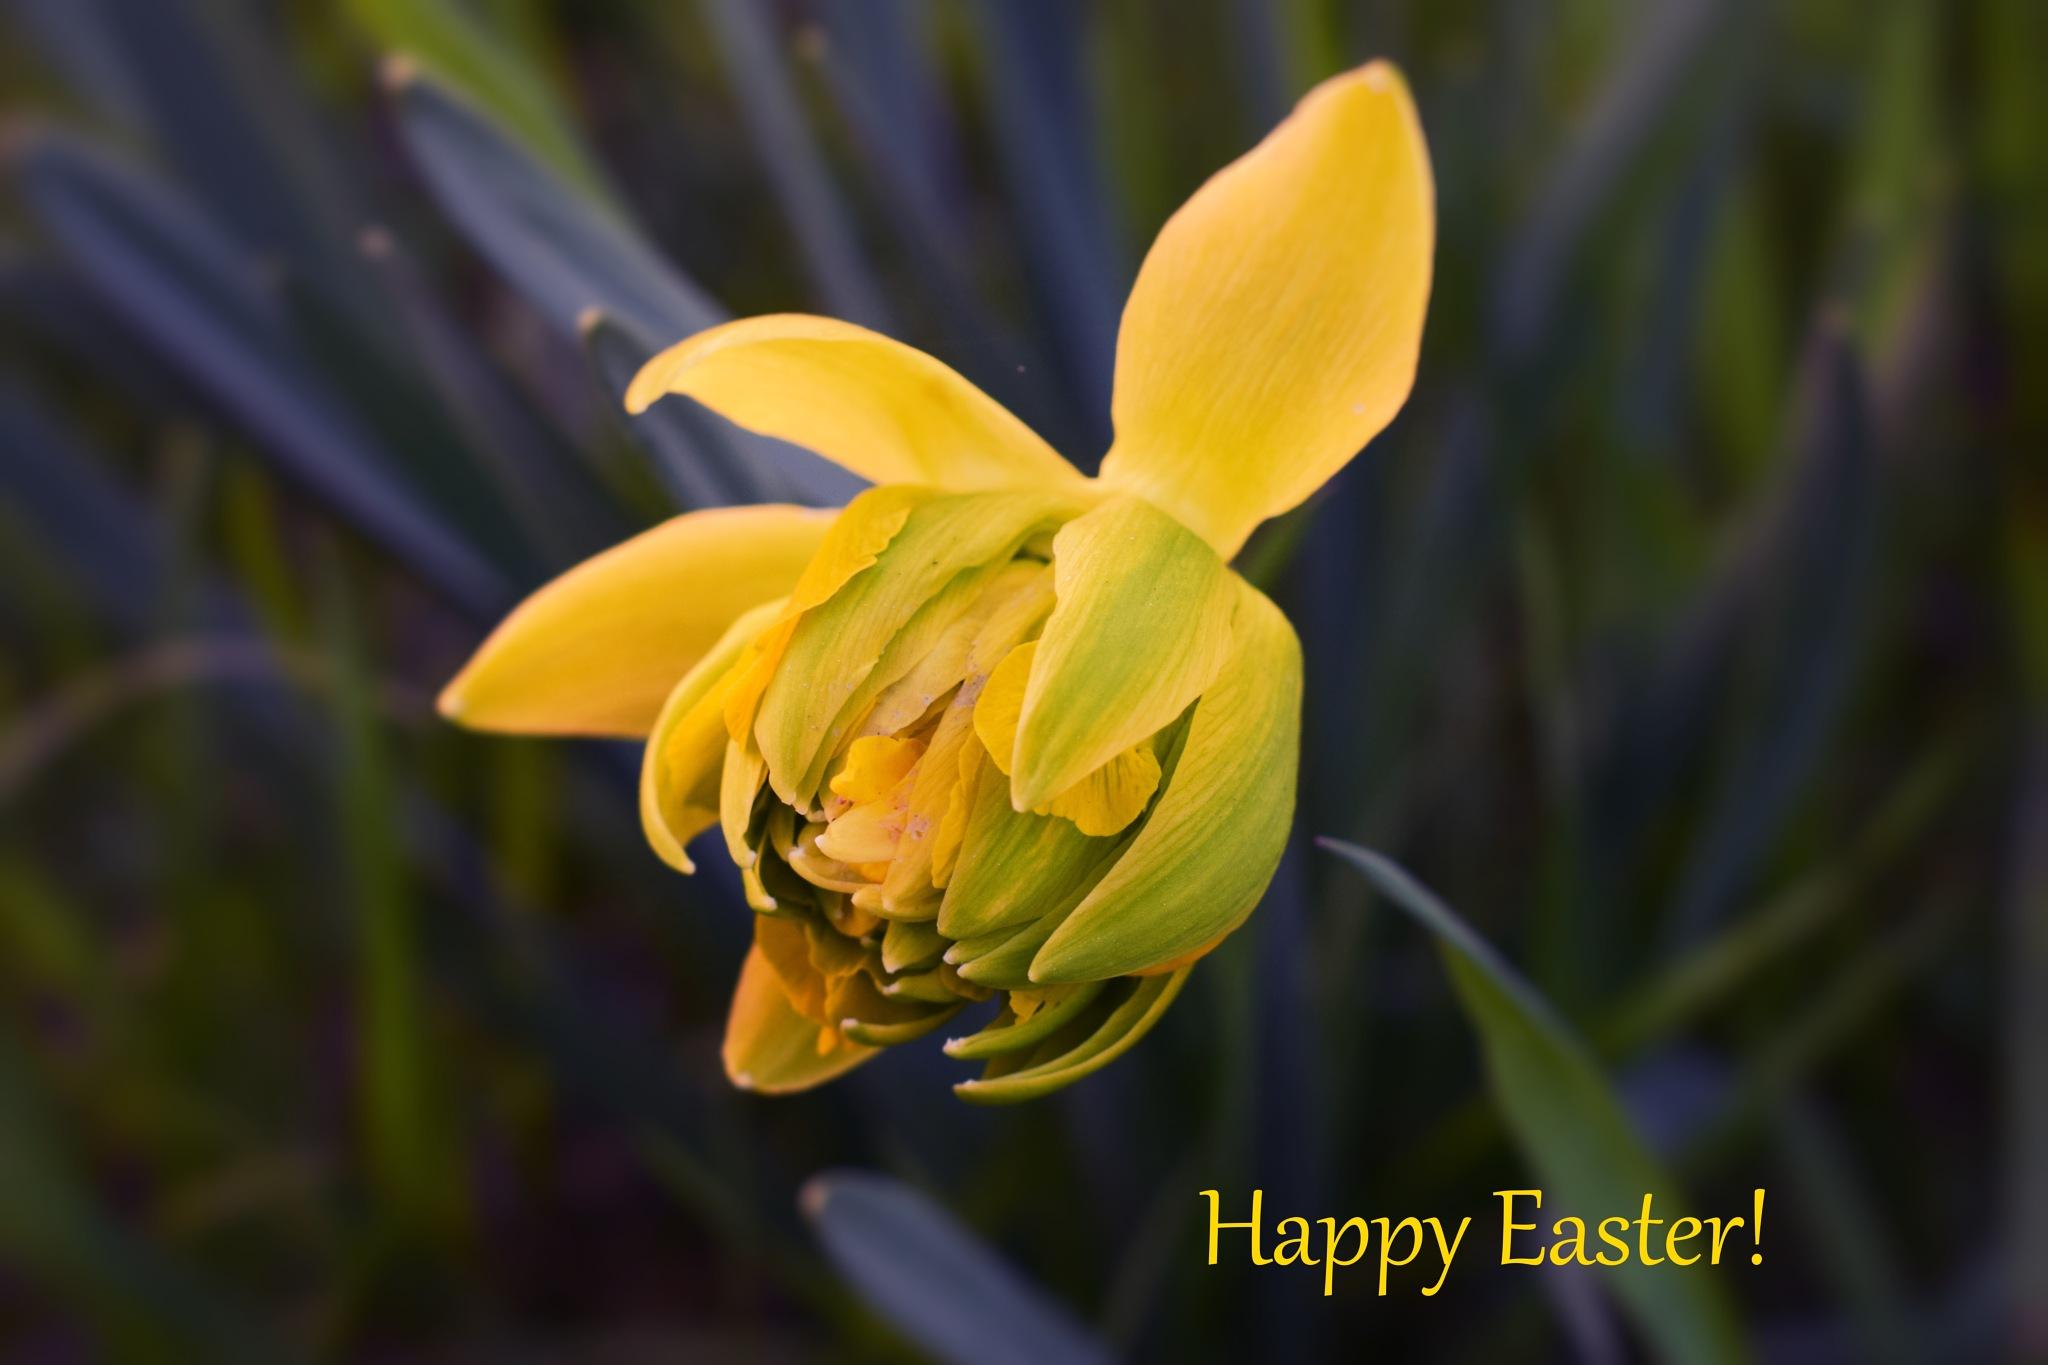 Happy Easter by Javorka